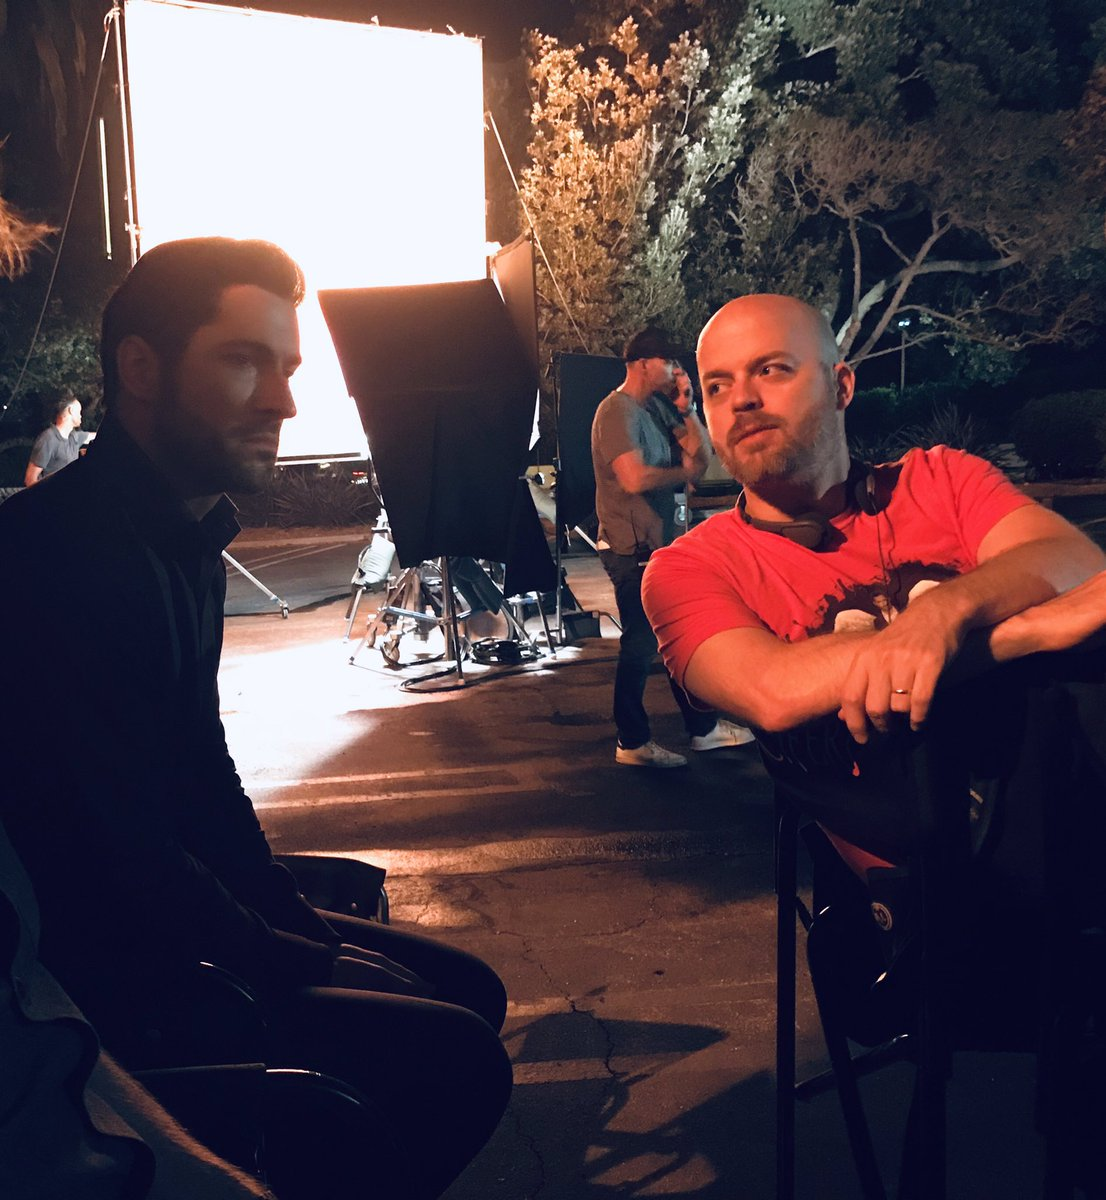 Tom Ellis Lucifer Season 3: New Tom Ellis Pictures And Video